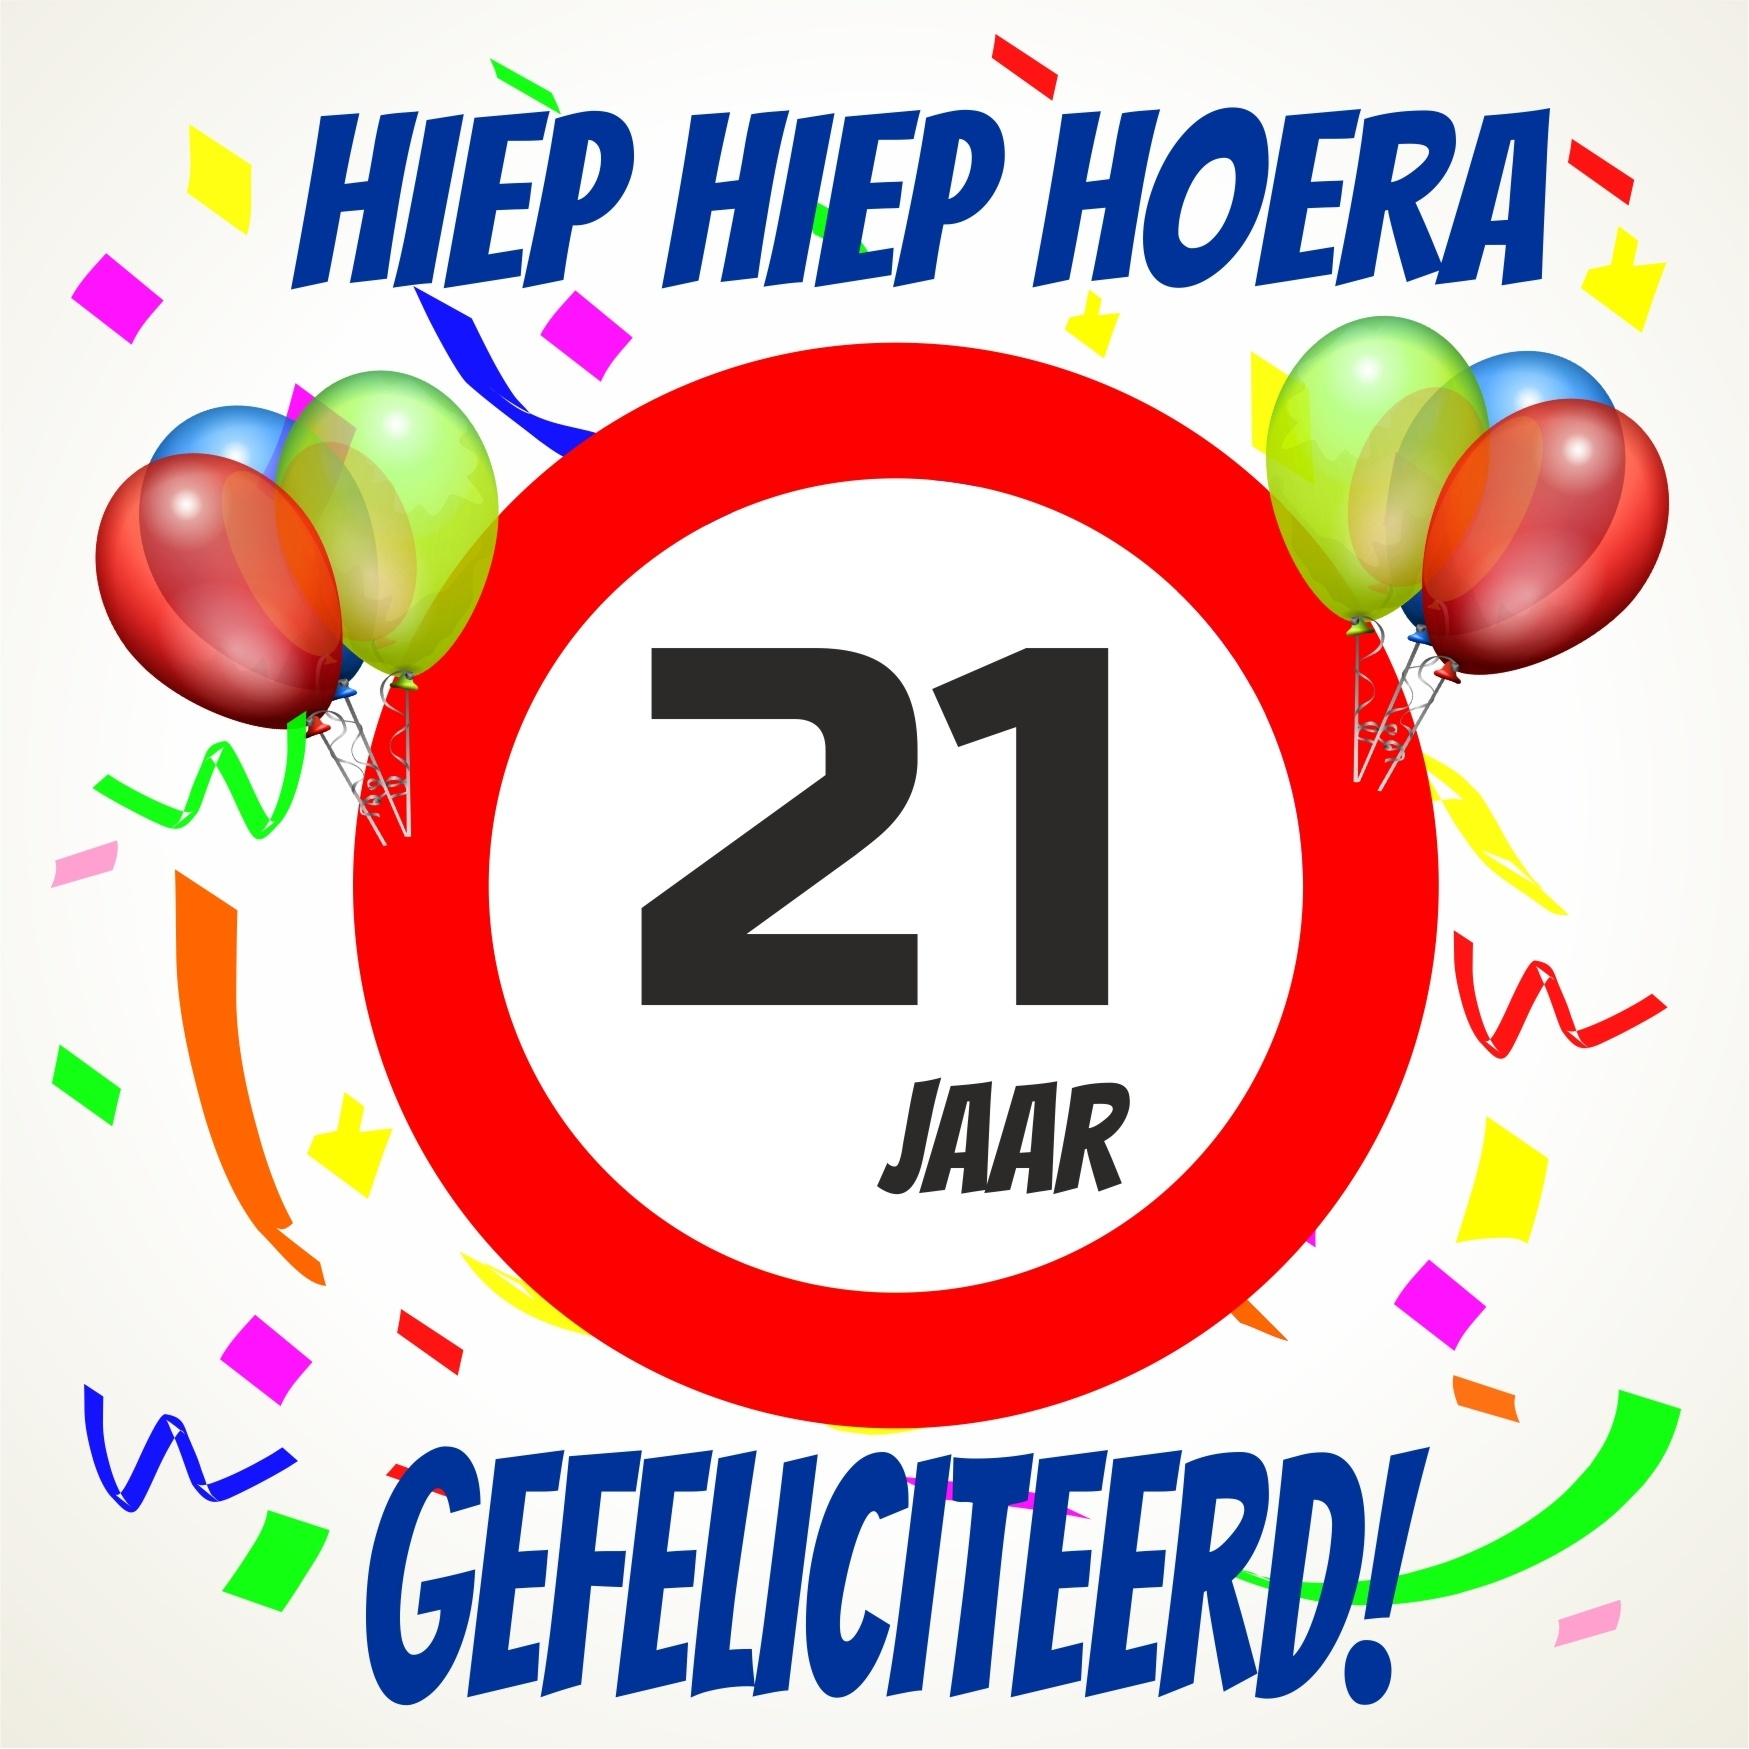 hoera 21 jaar Humor Verjaardagswensen 21 Jaar   ARCHIDEV hoera 21 jaar